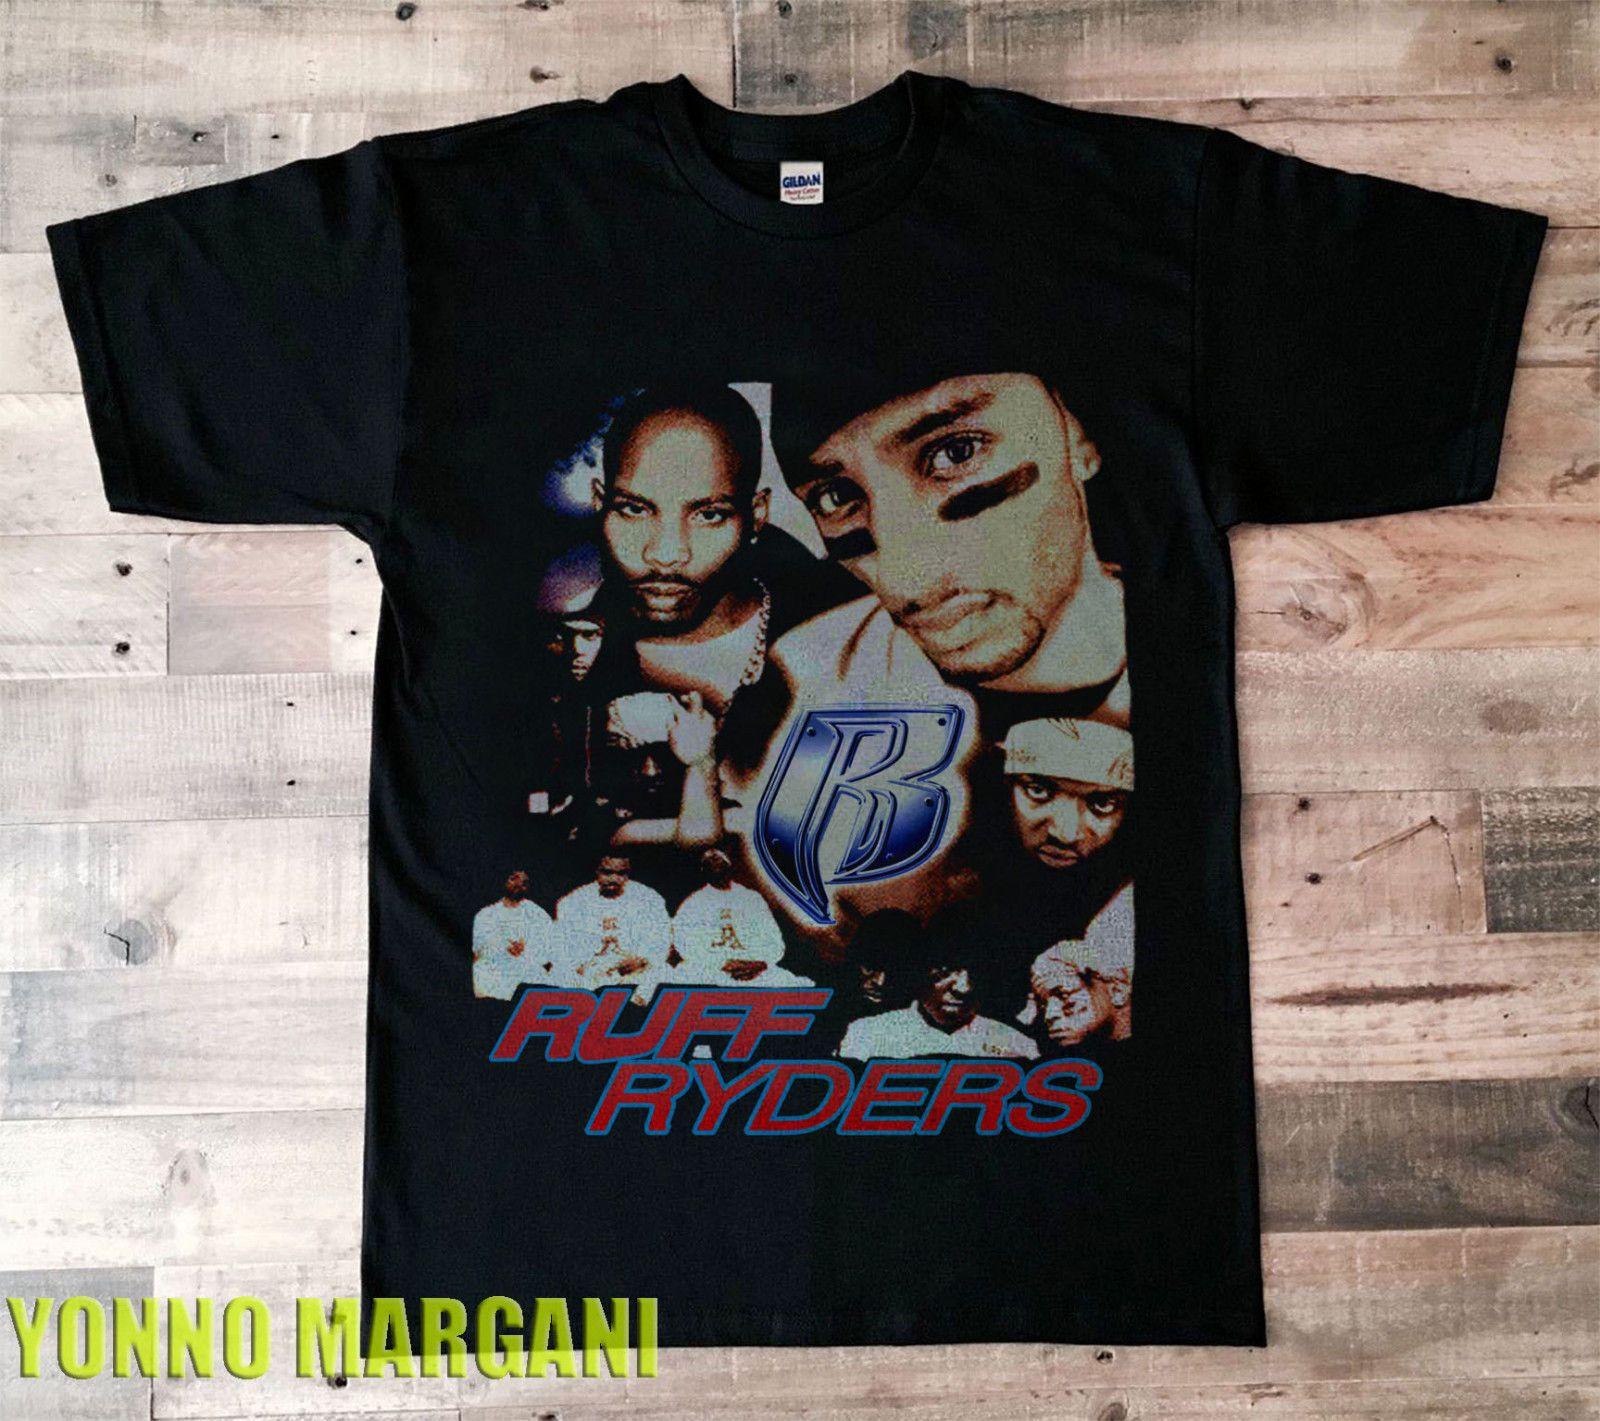 90s Hip Hop Clothes Online - Nils Stucki Kieferorthopäde